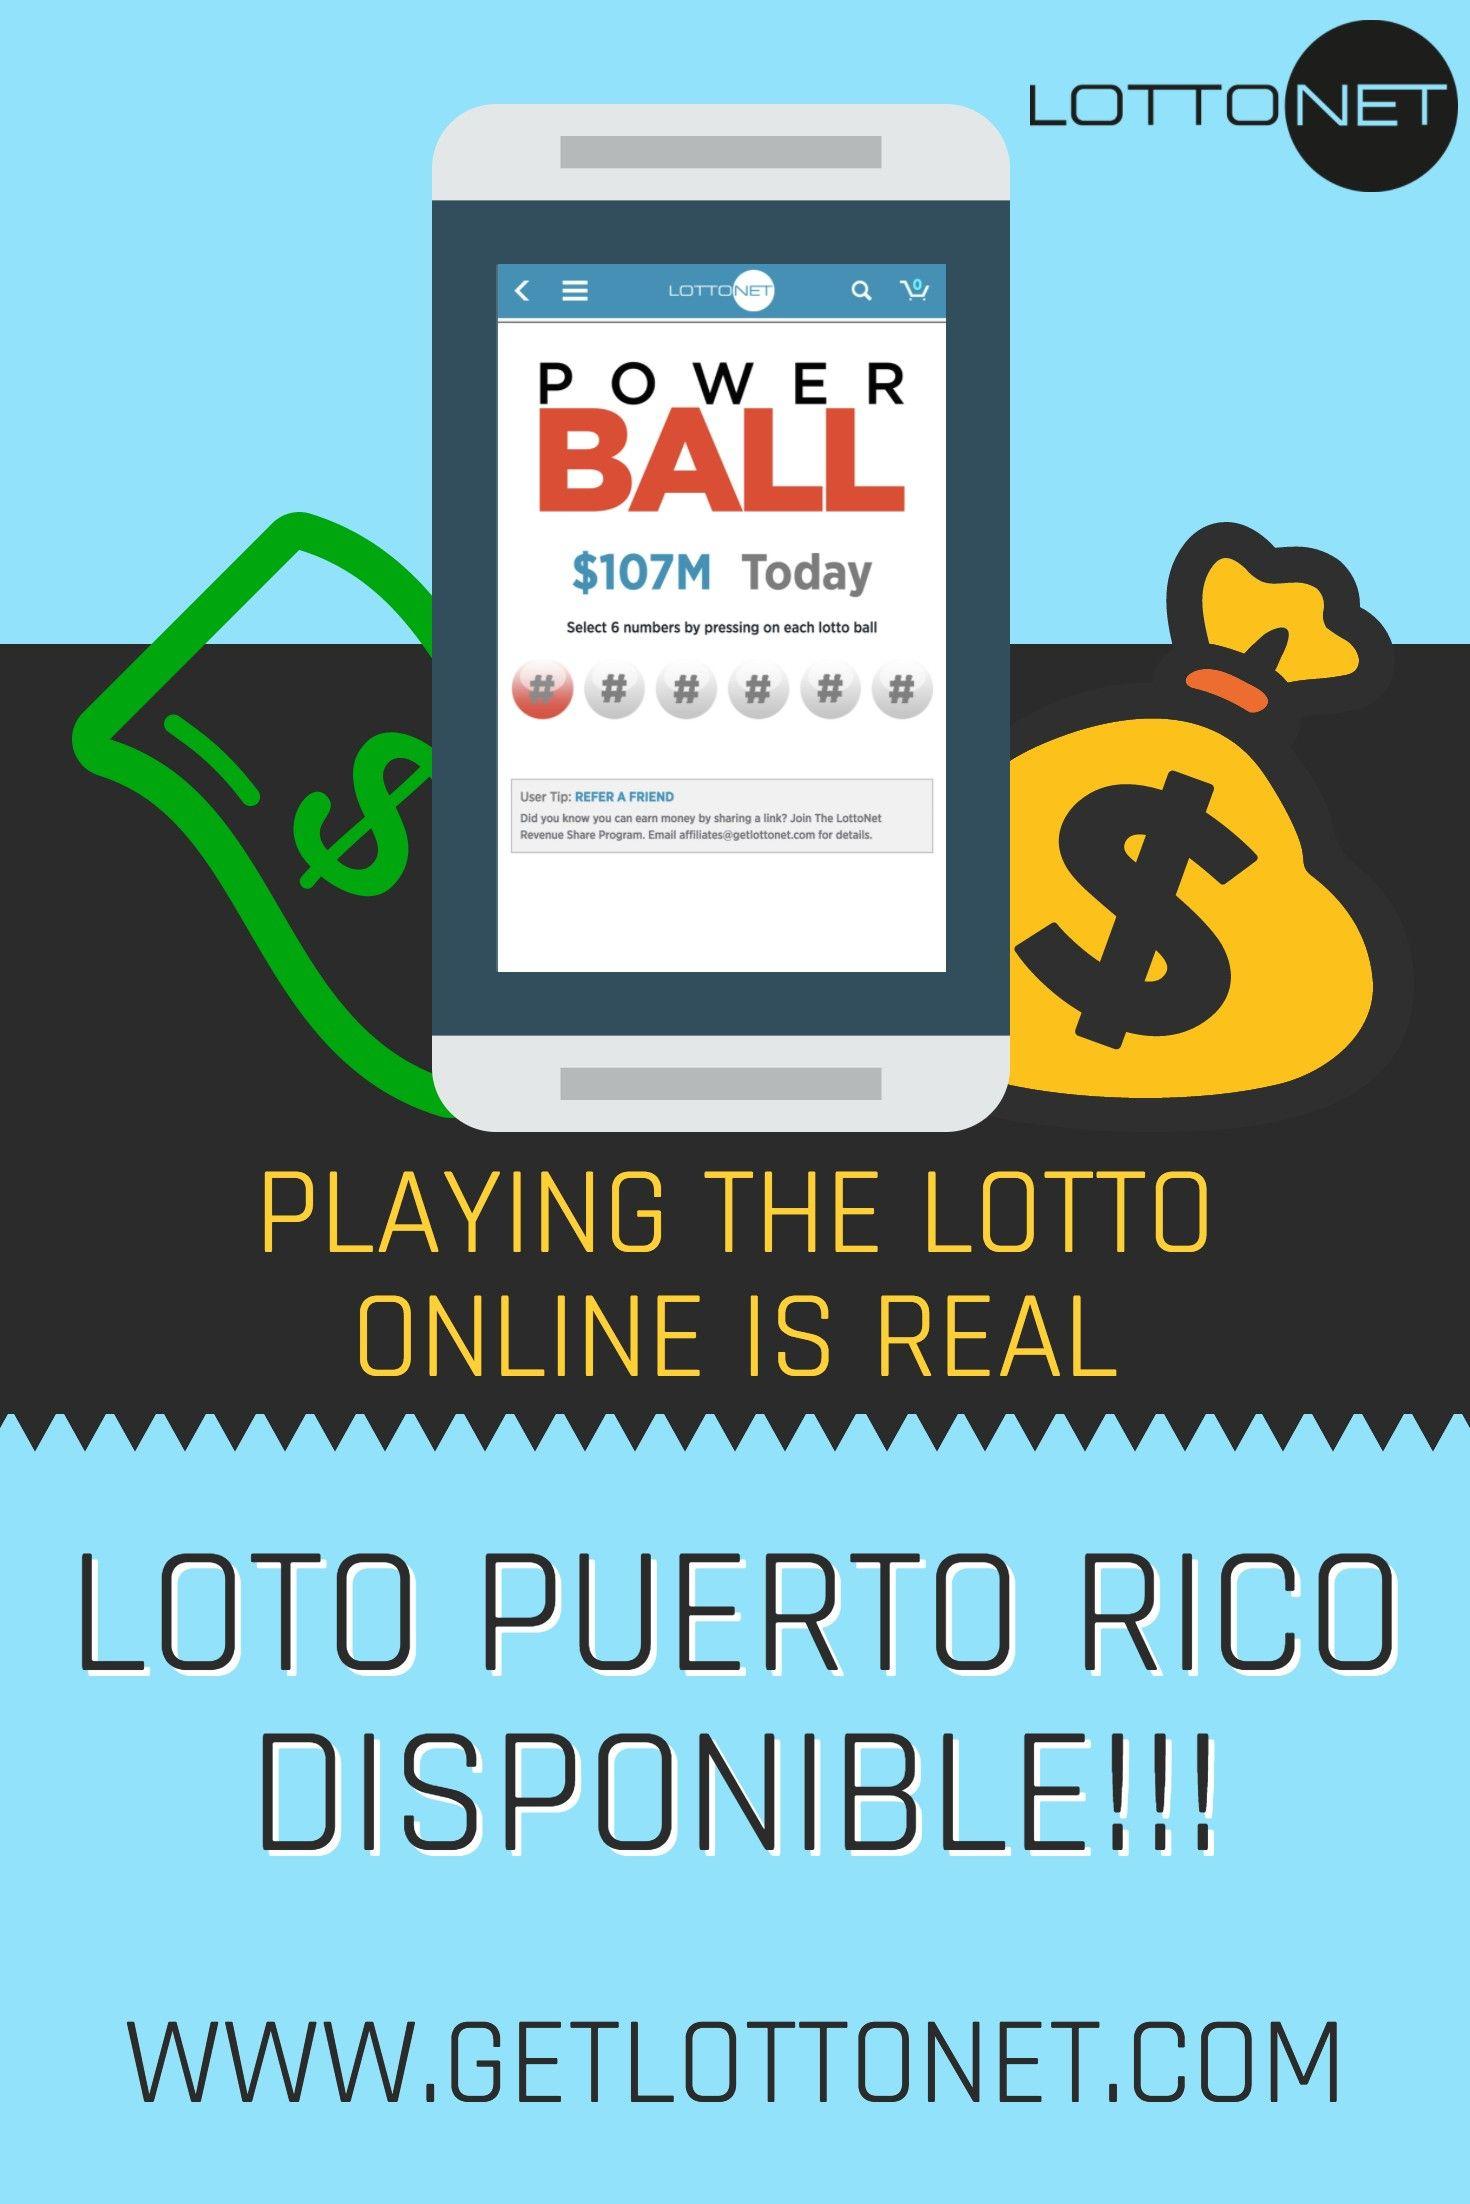 Lottonet